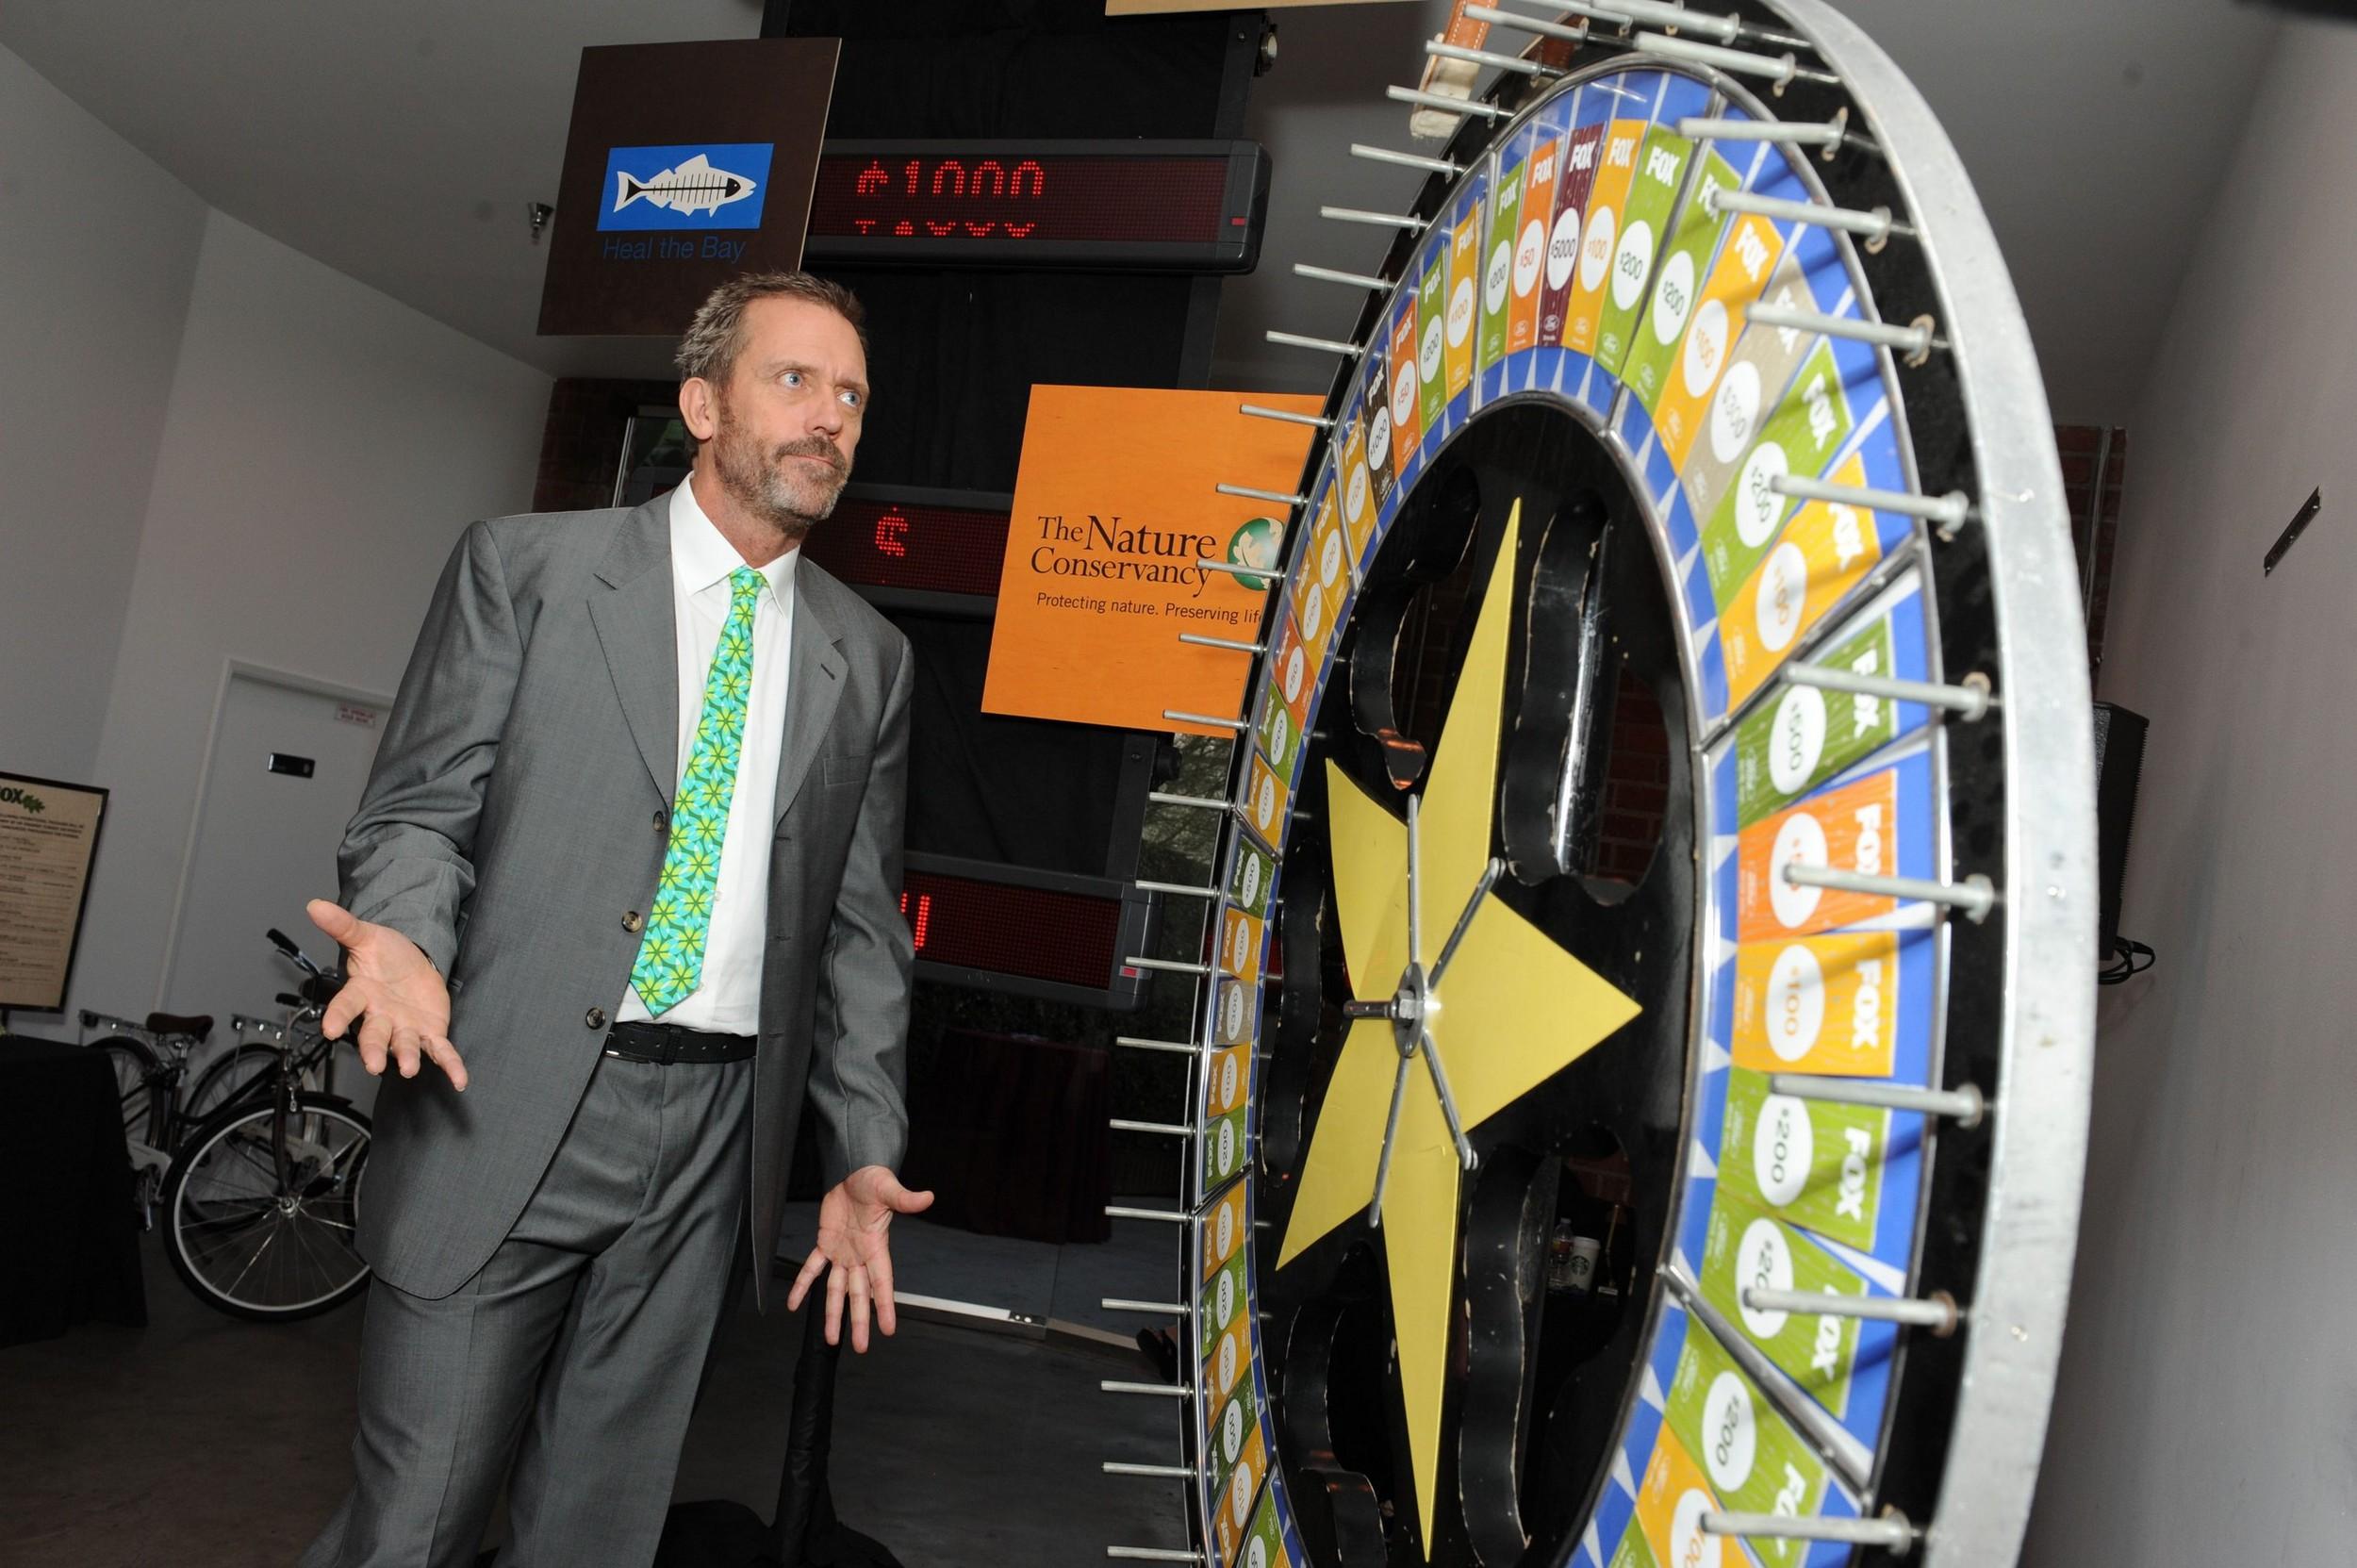 Hugh-Laurie-FOX-Fall-Eco-Casino-Party-2011-hugh-laurie-25284715-2560-1703.jpg